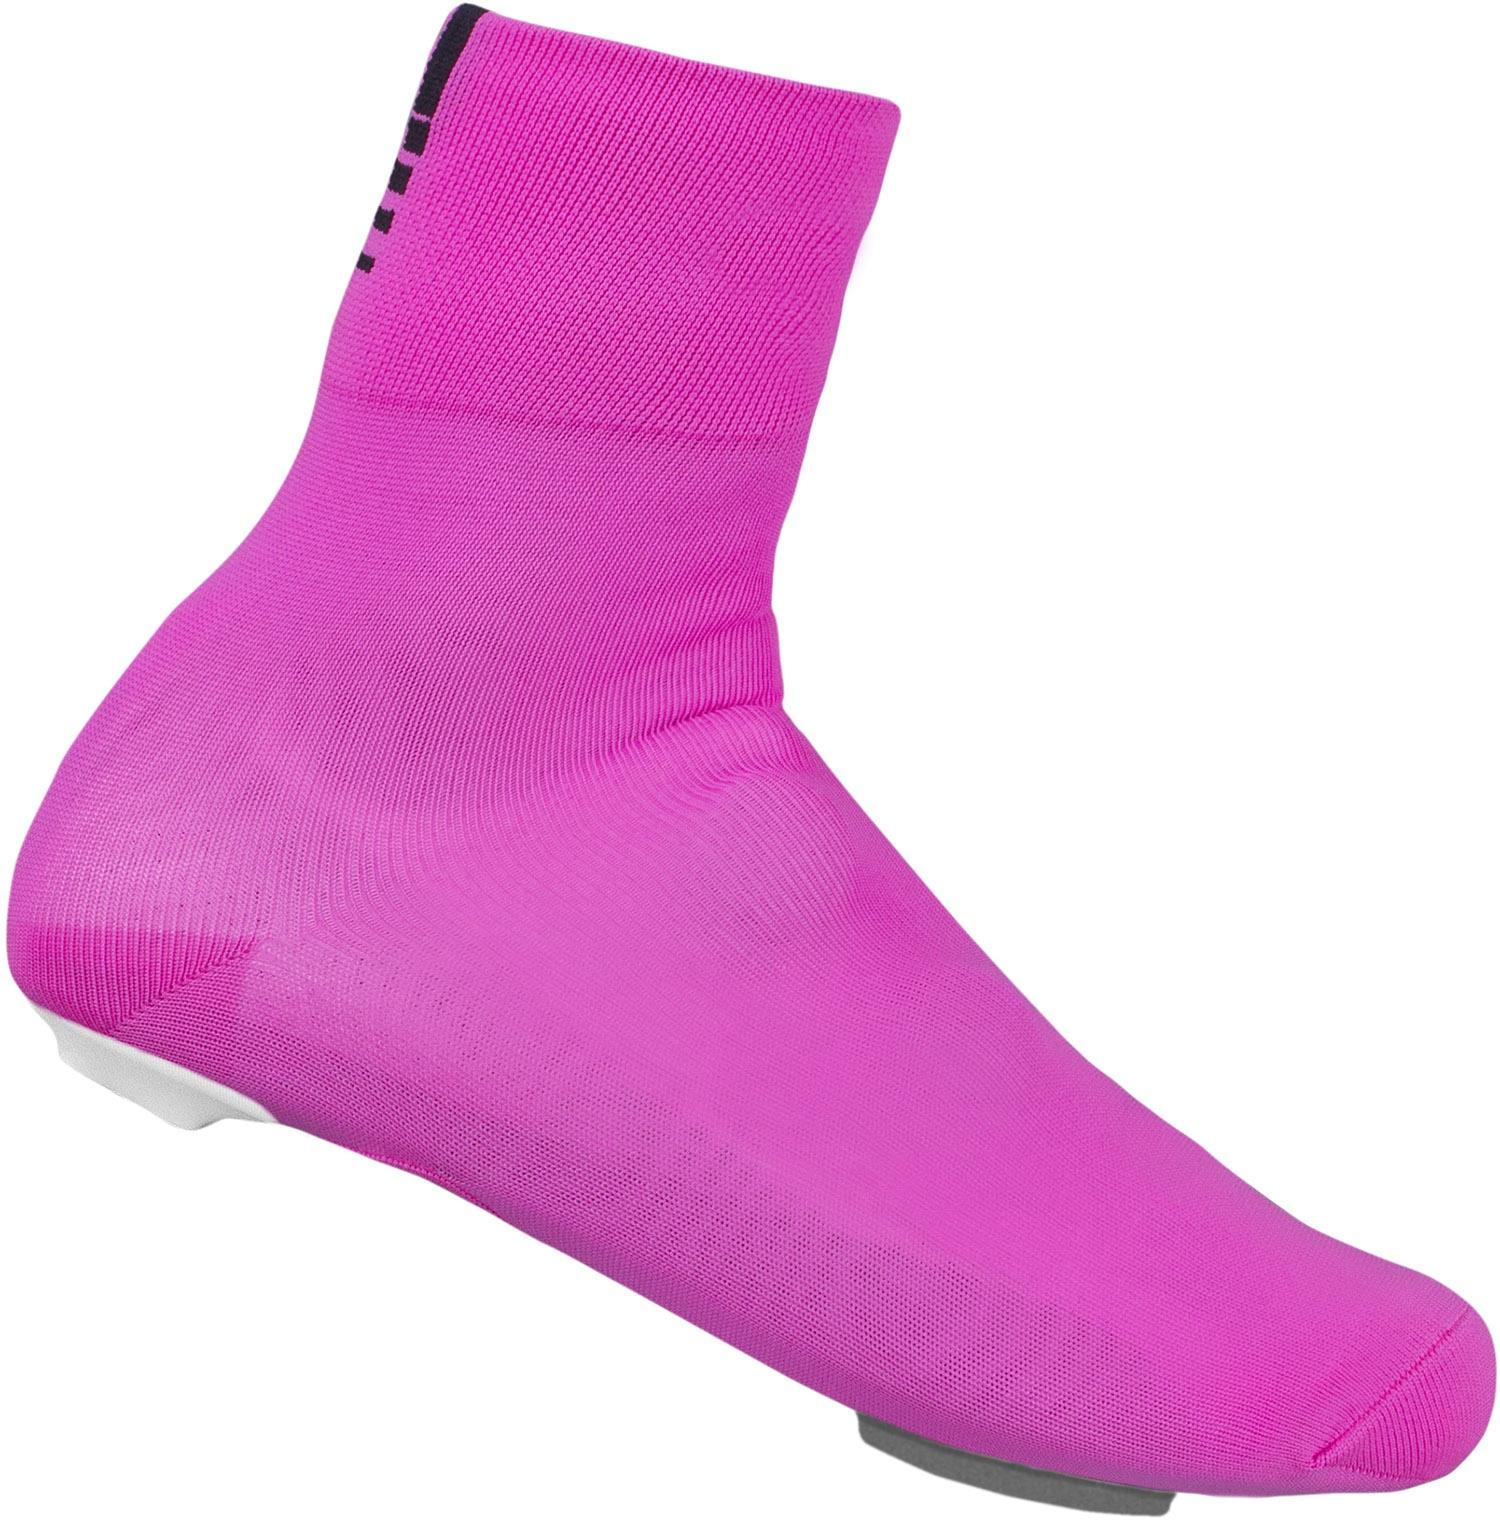 Køb GripGrab Primavera Overgangs Cover Sock – Lyserød